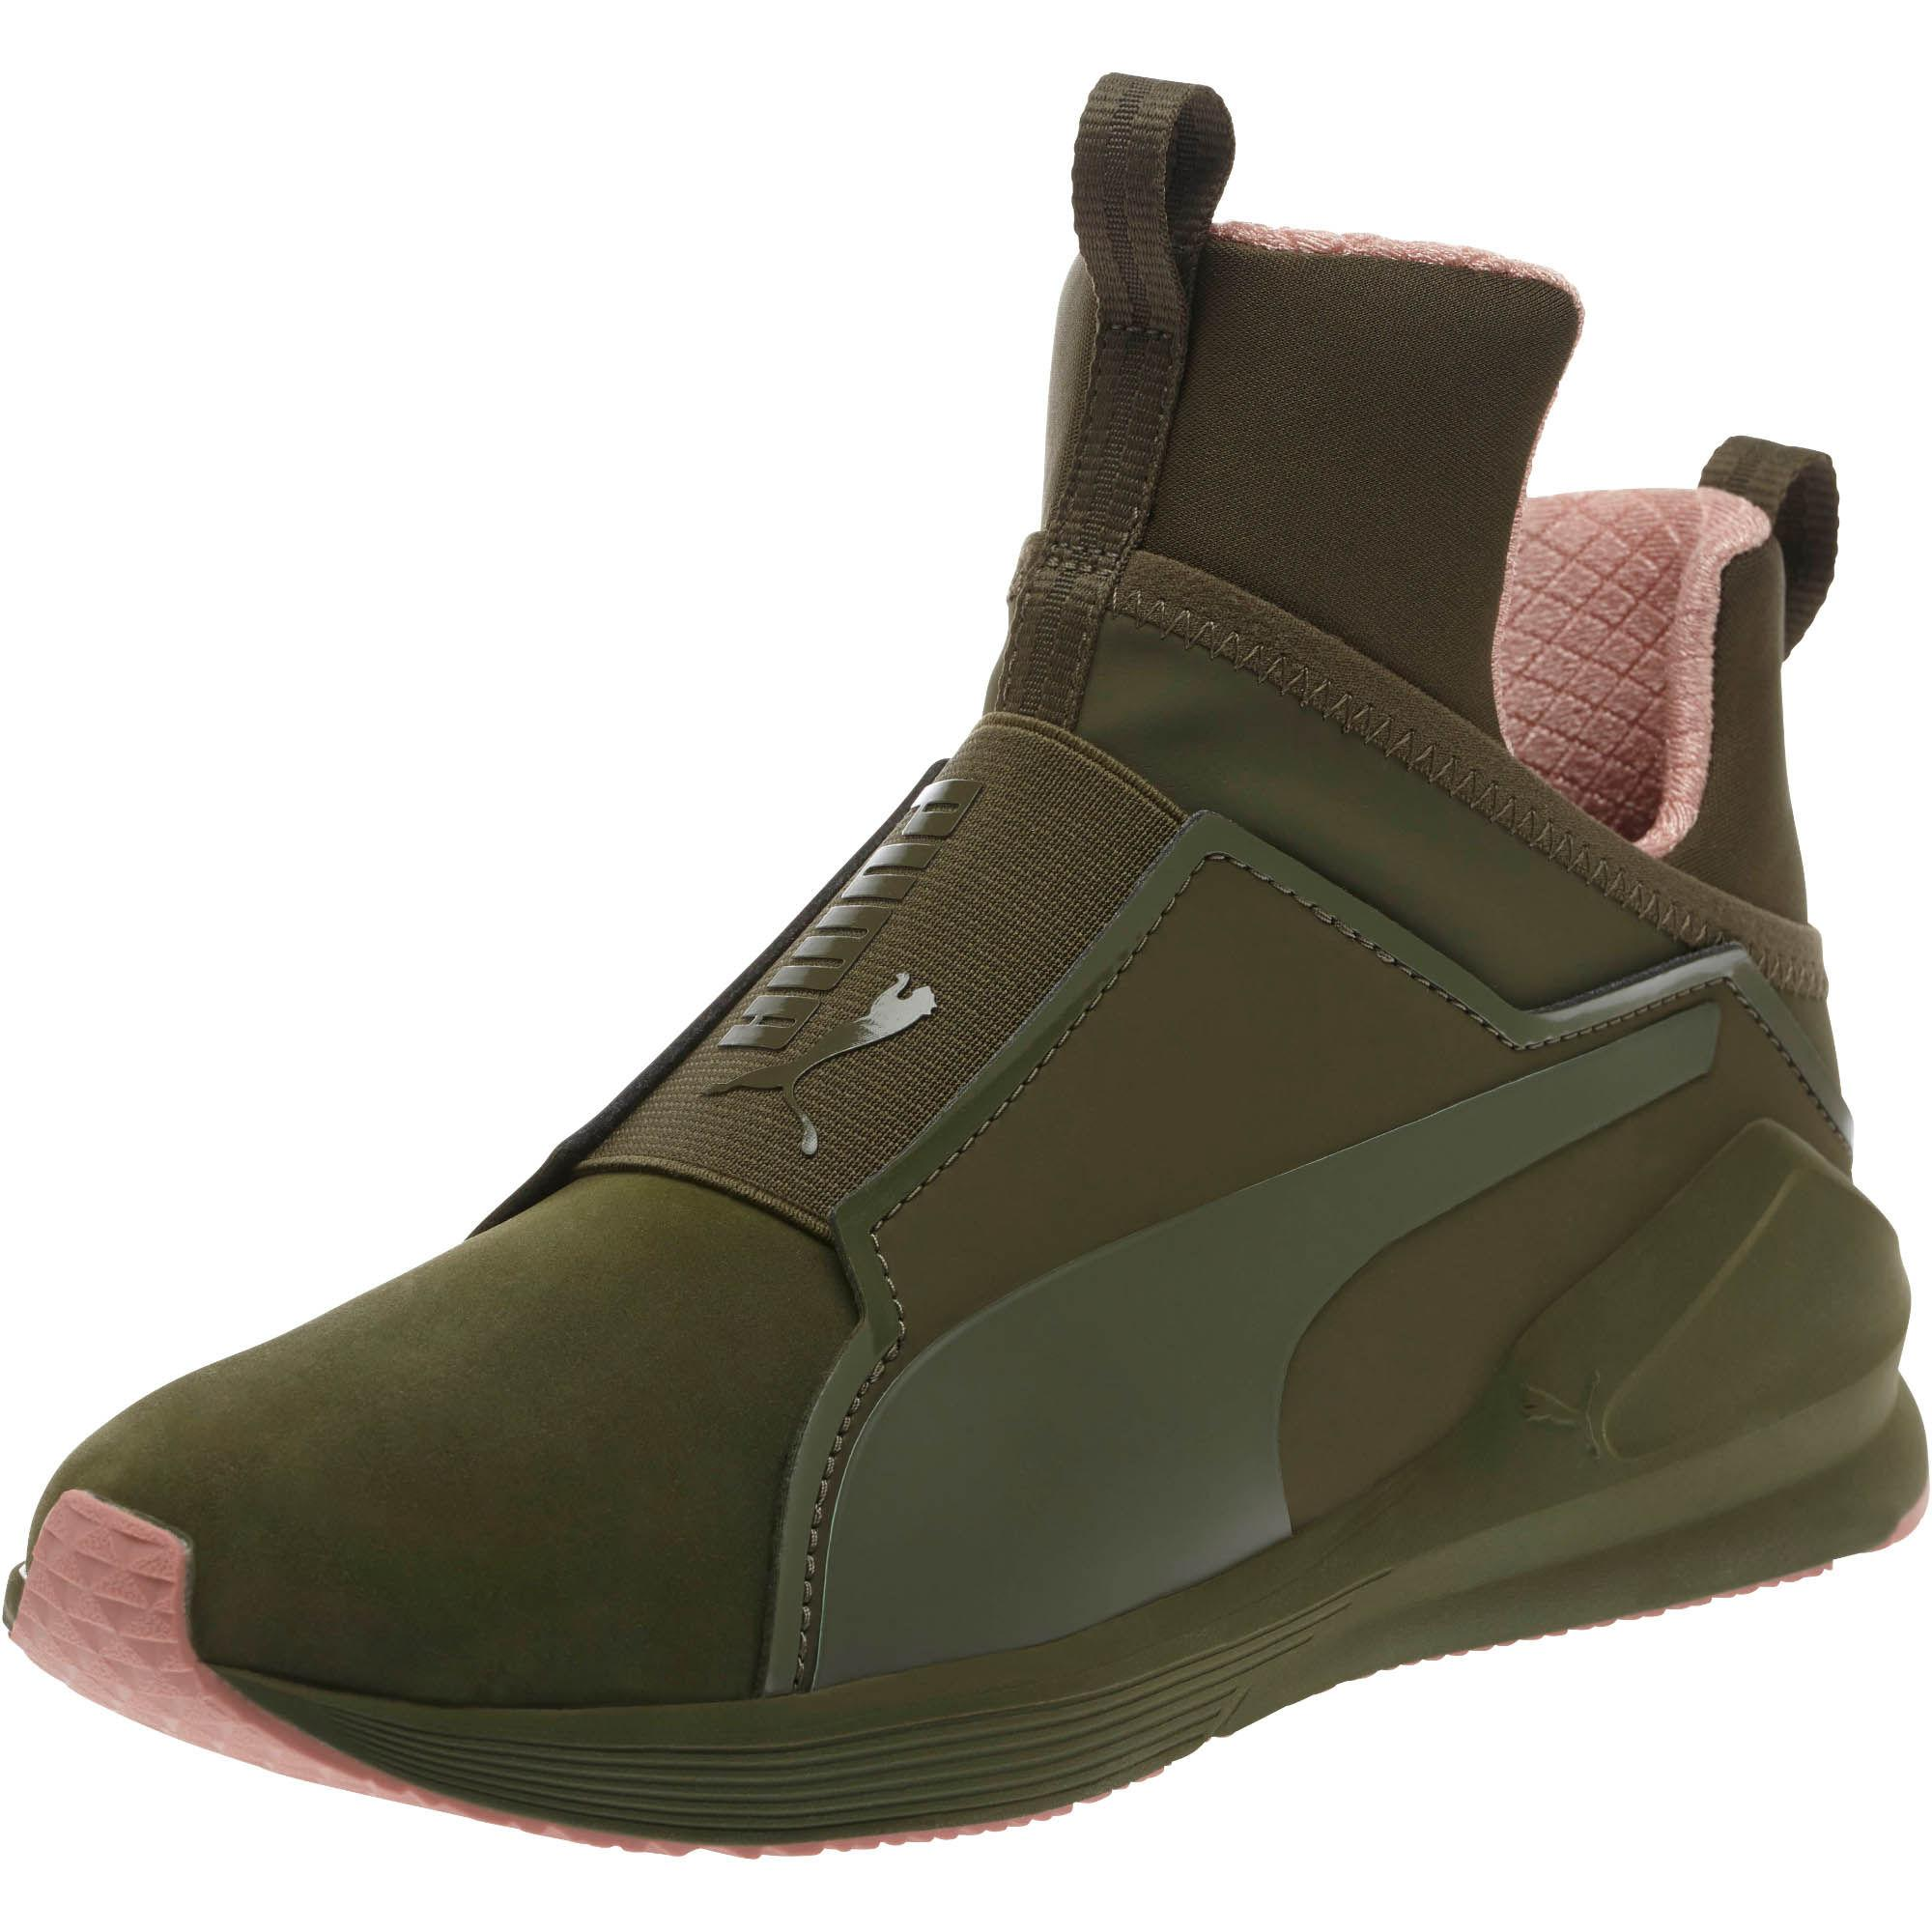 Lyst - PUMA Fierce Nubuck Naturals Women s Training Shoes in Green 535bef454